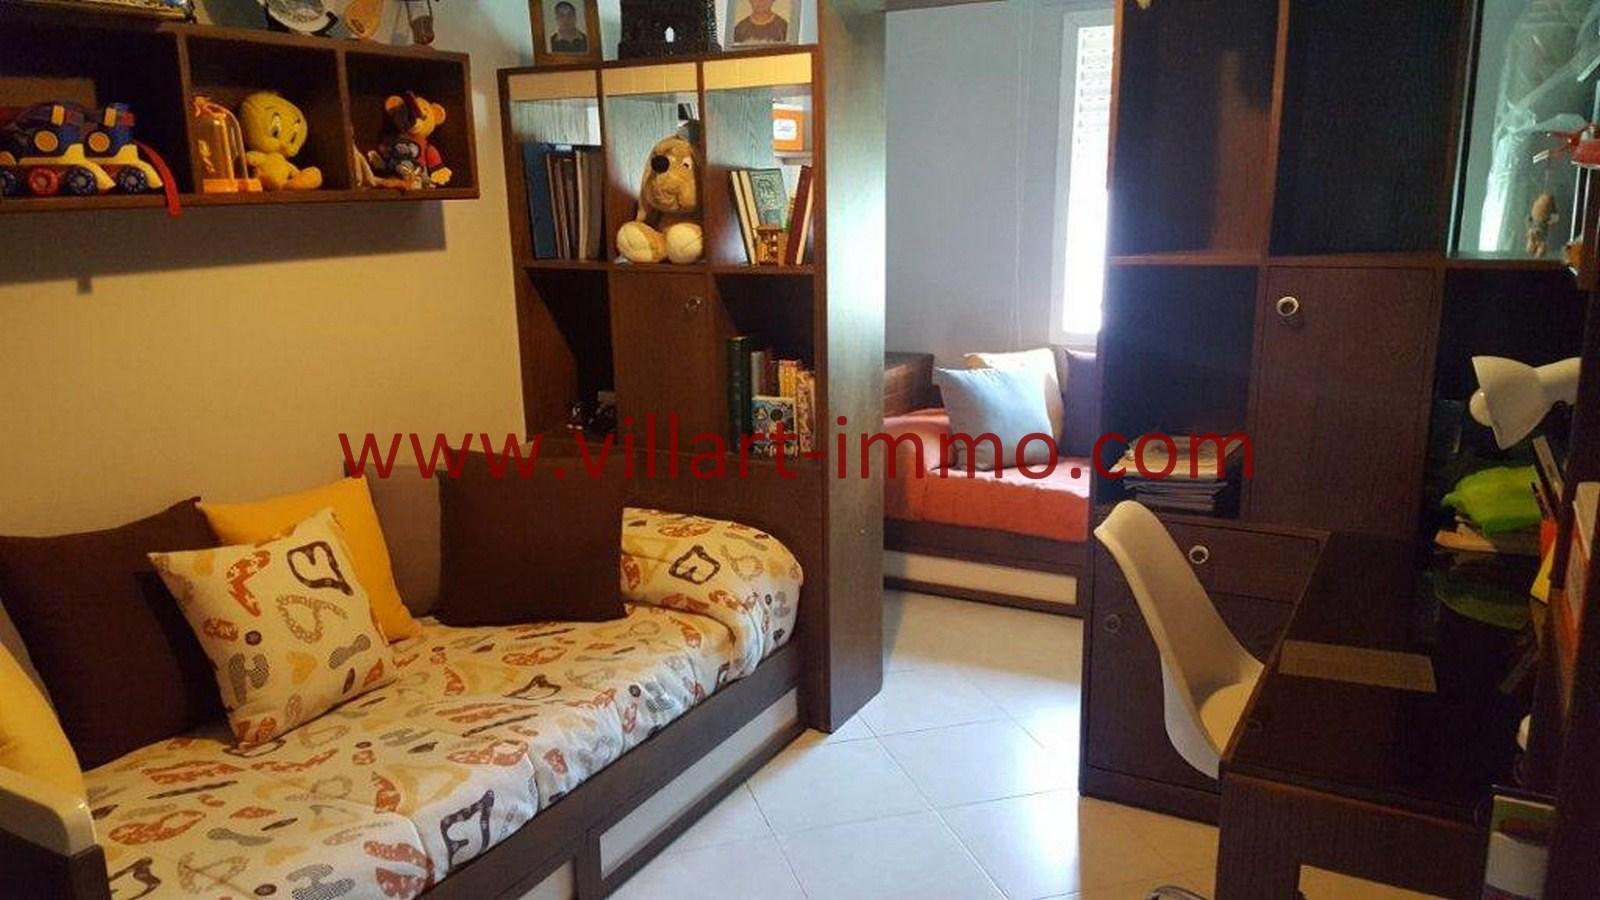 5-Vente-Appartement-Tanger-Chambre 1-VA523-Centre ville -Villart Immo